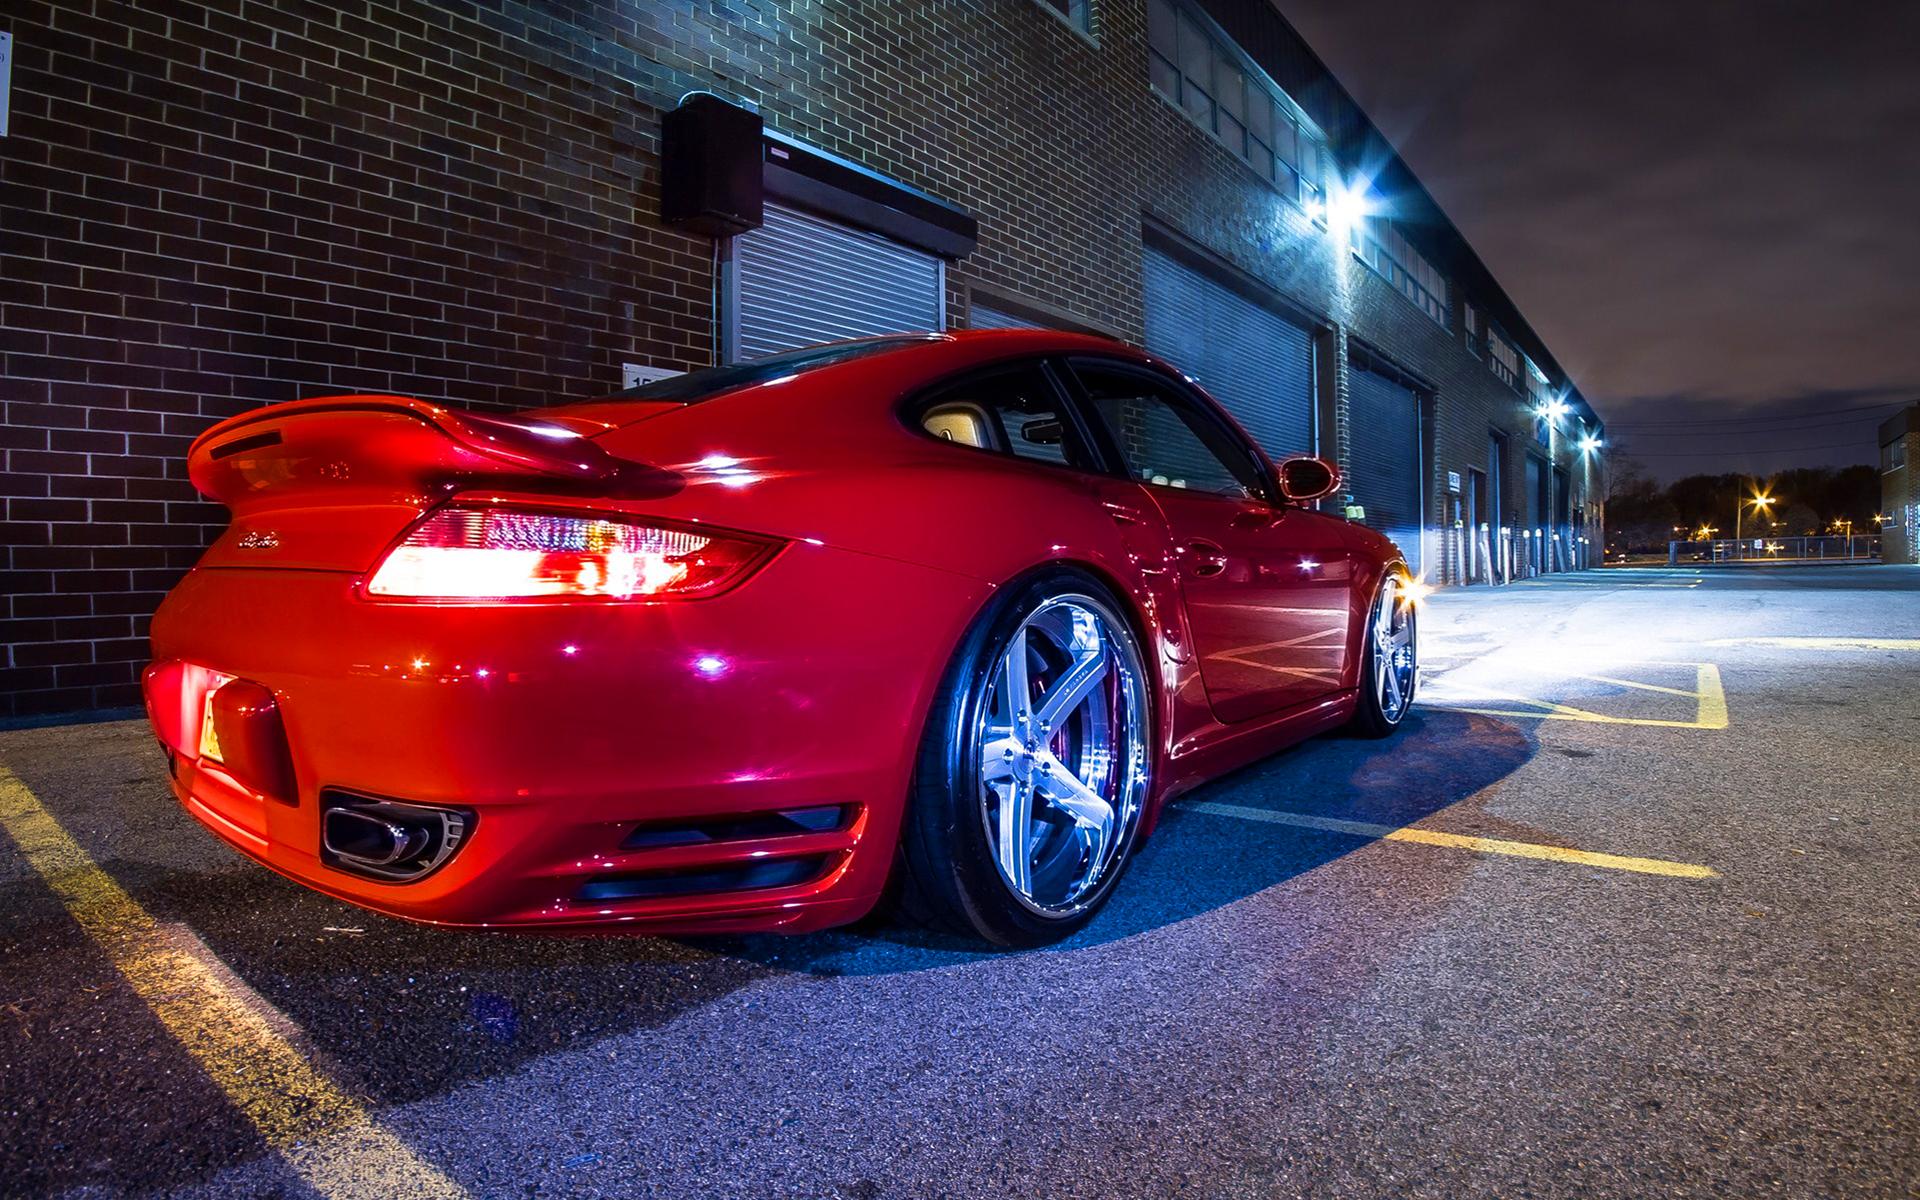 Porsche 997tt forged